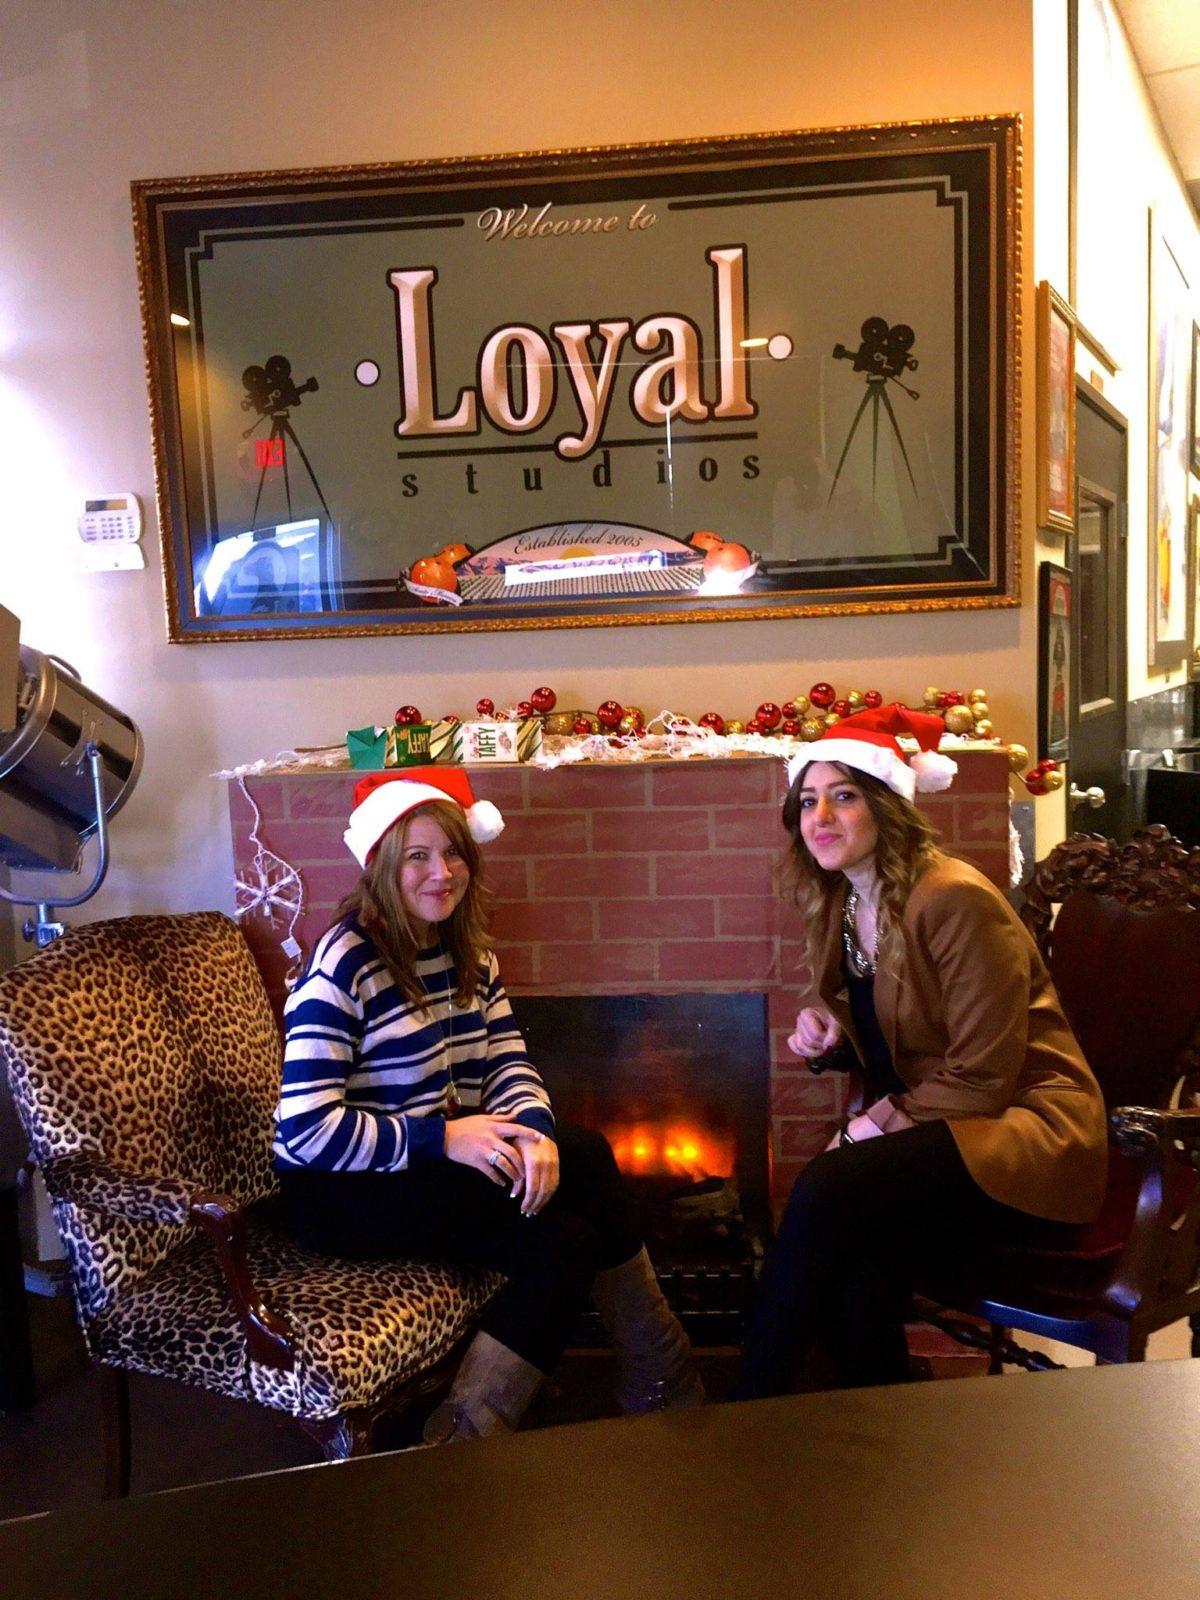 Loyal Studios happy holidays